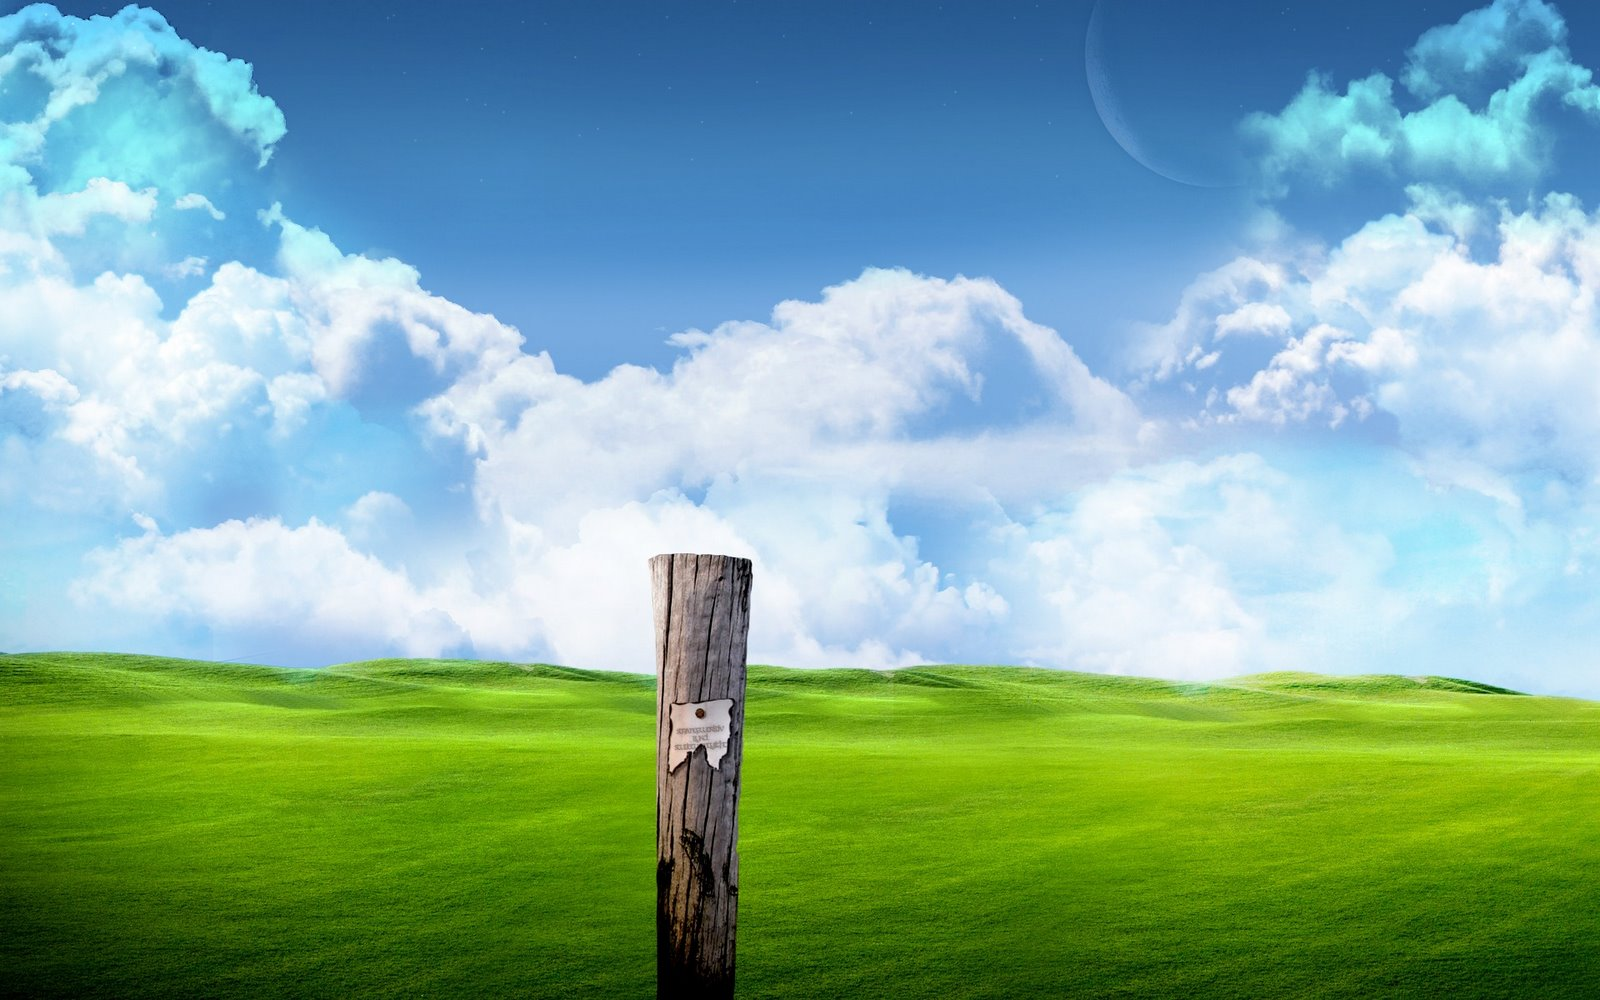 Beautiful HD Wallpapers: Beautiful Nature HD Wallpapers